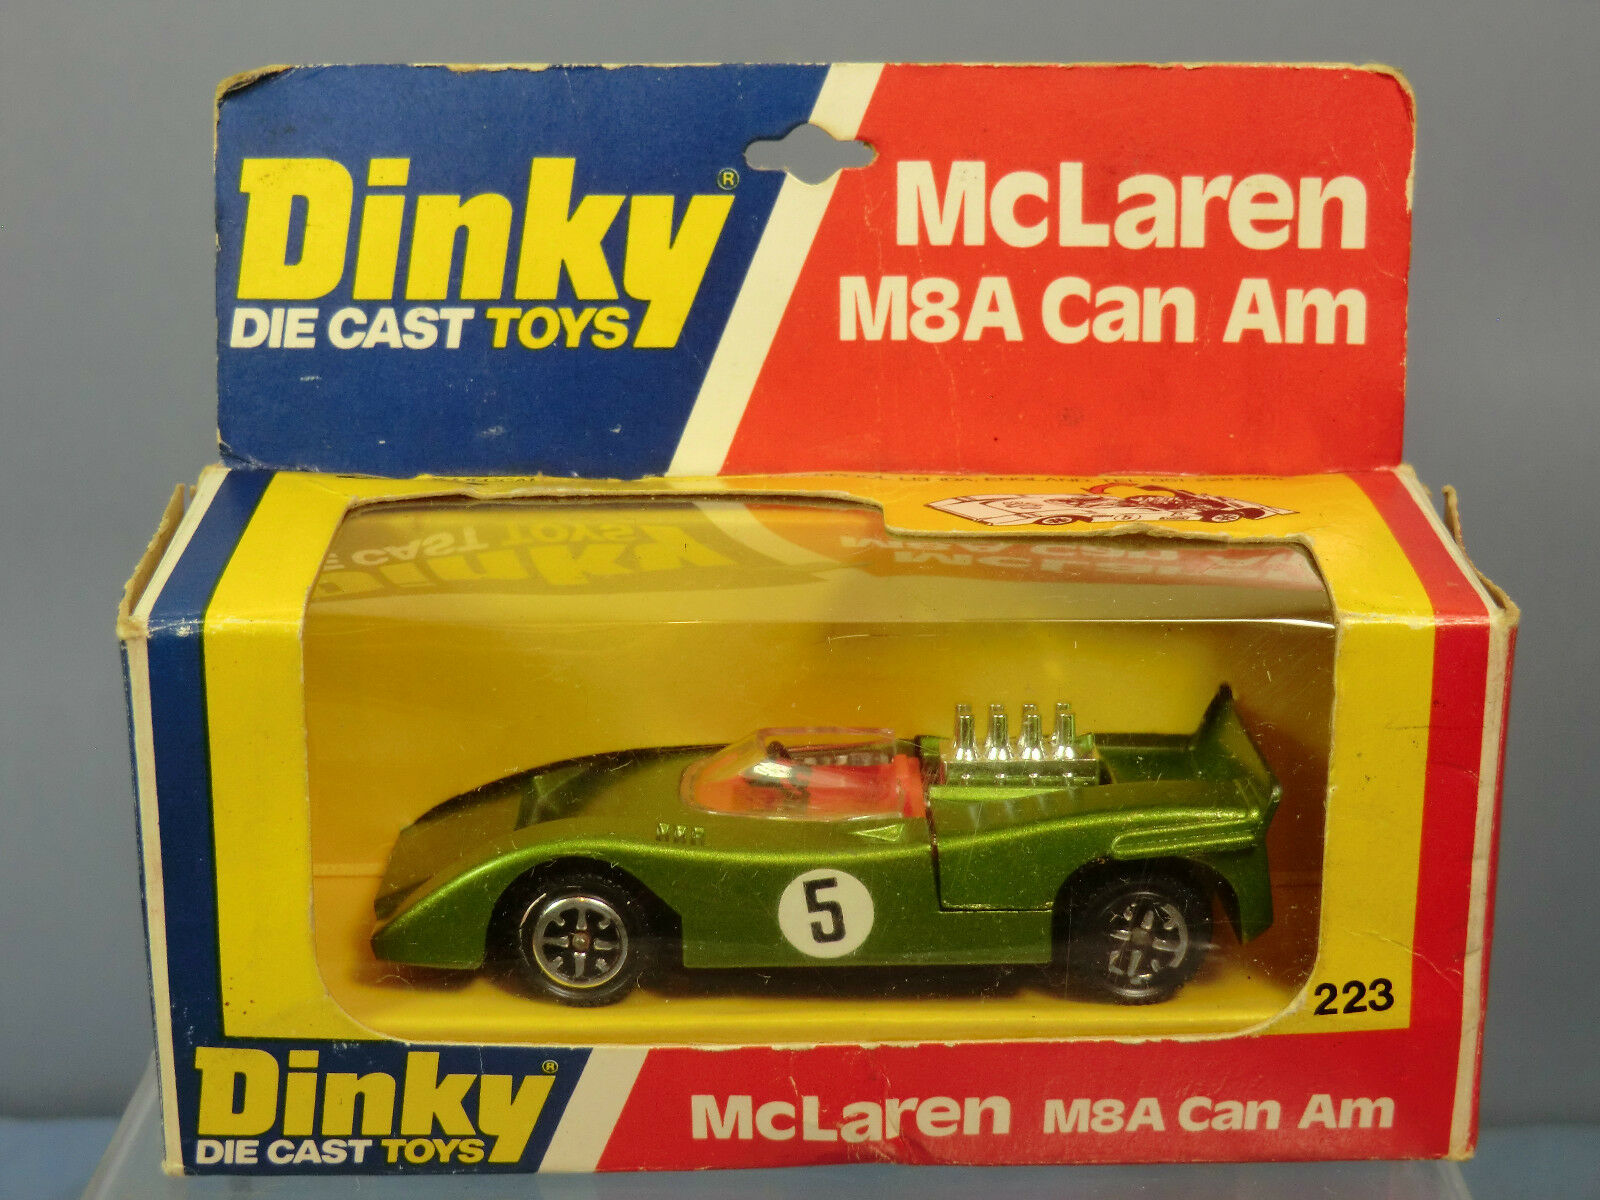 DINKY TOYS MODEL No.223 mclauren M8A CAN AM AM AM  RACING No.5  VERSIONE VERDE  Nuovo di zecca con scatola ee0a02